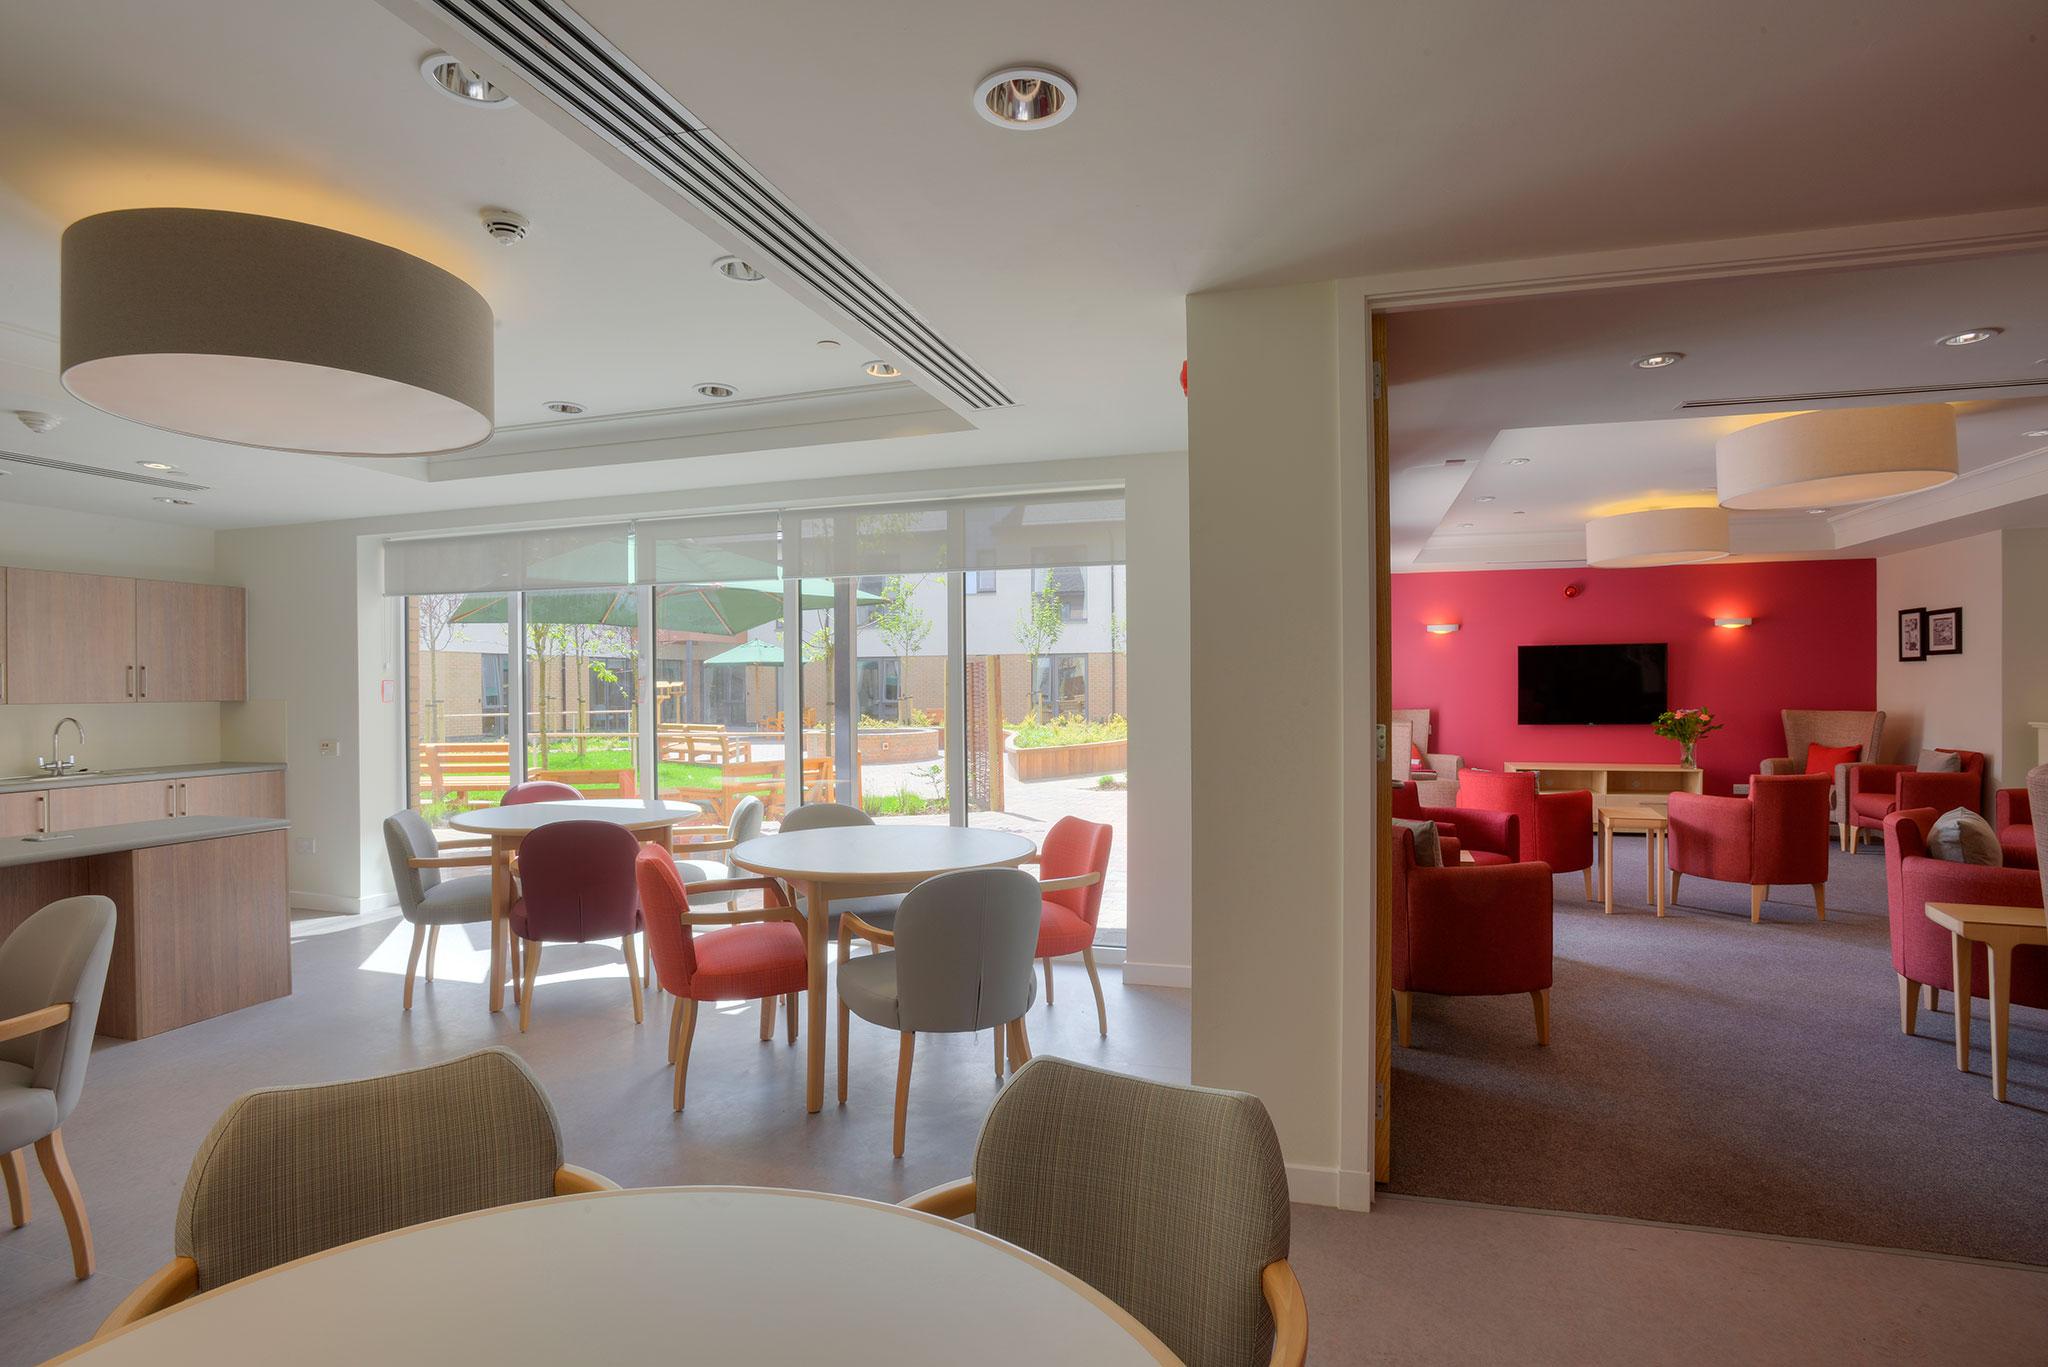 Interior Design For The Elderly